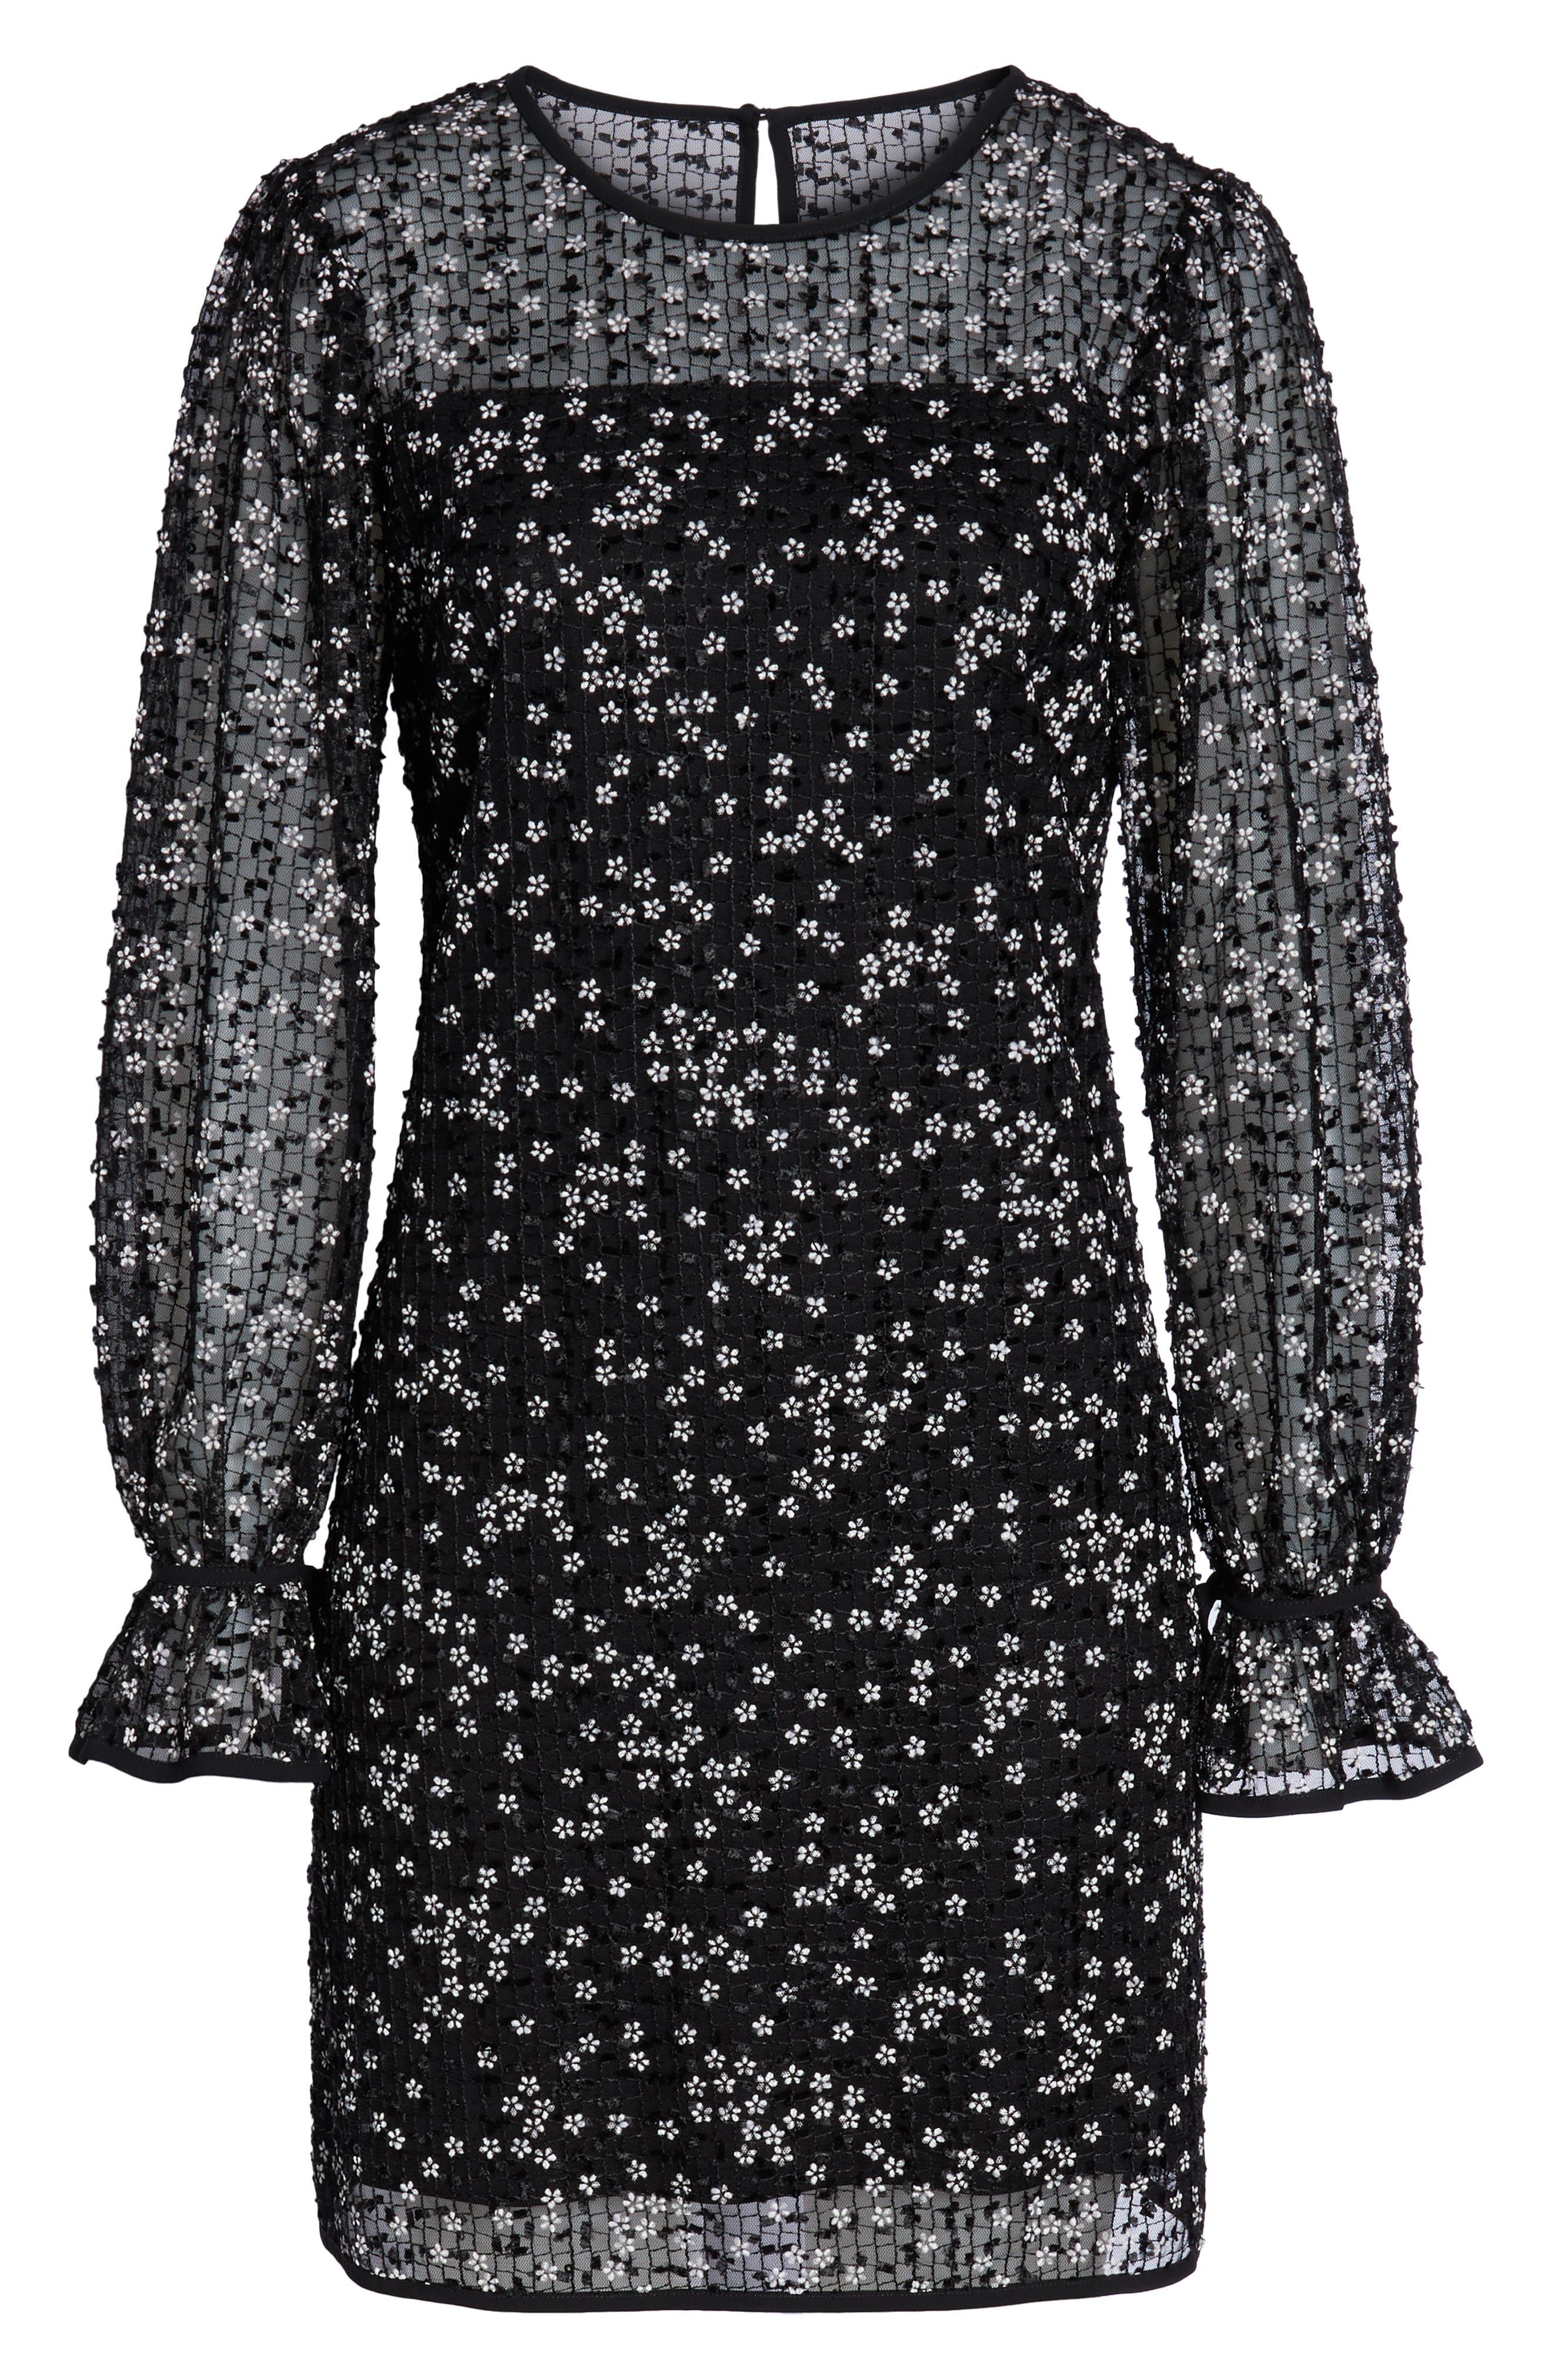 CHELSEA28, Floral Grid Shift Dress, Alternate thumbnail 7, color, 001